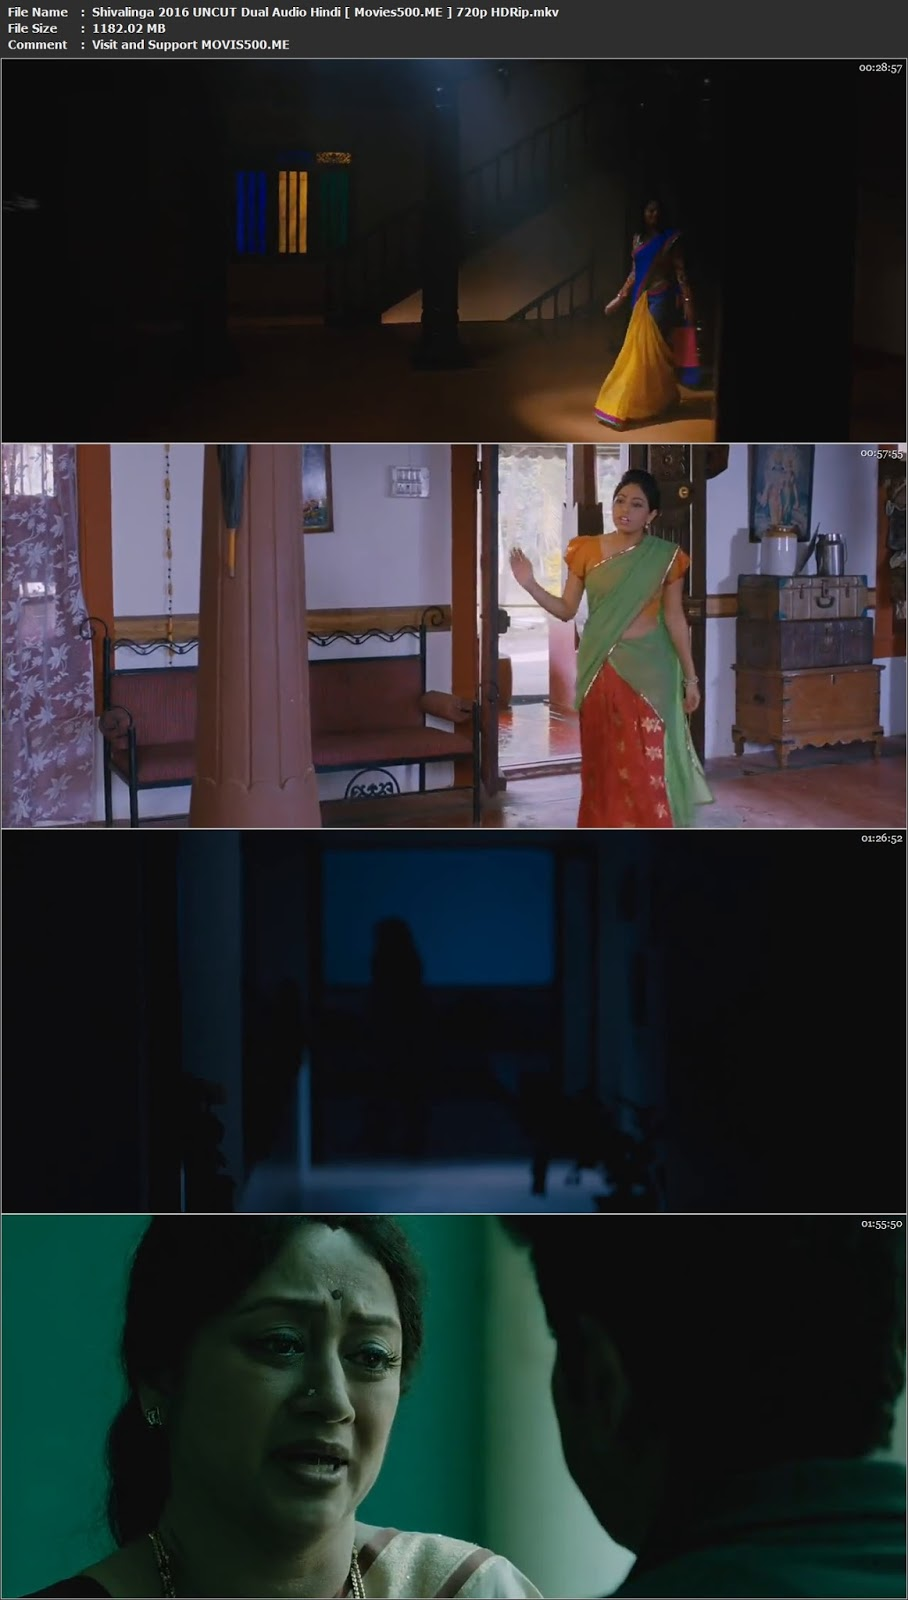 Shivalinga 2016 UNCUT Dual Audio Hindi HDRip 720p 1GB at movies500.site